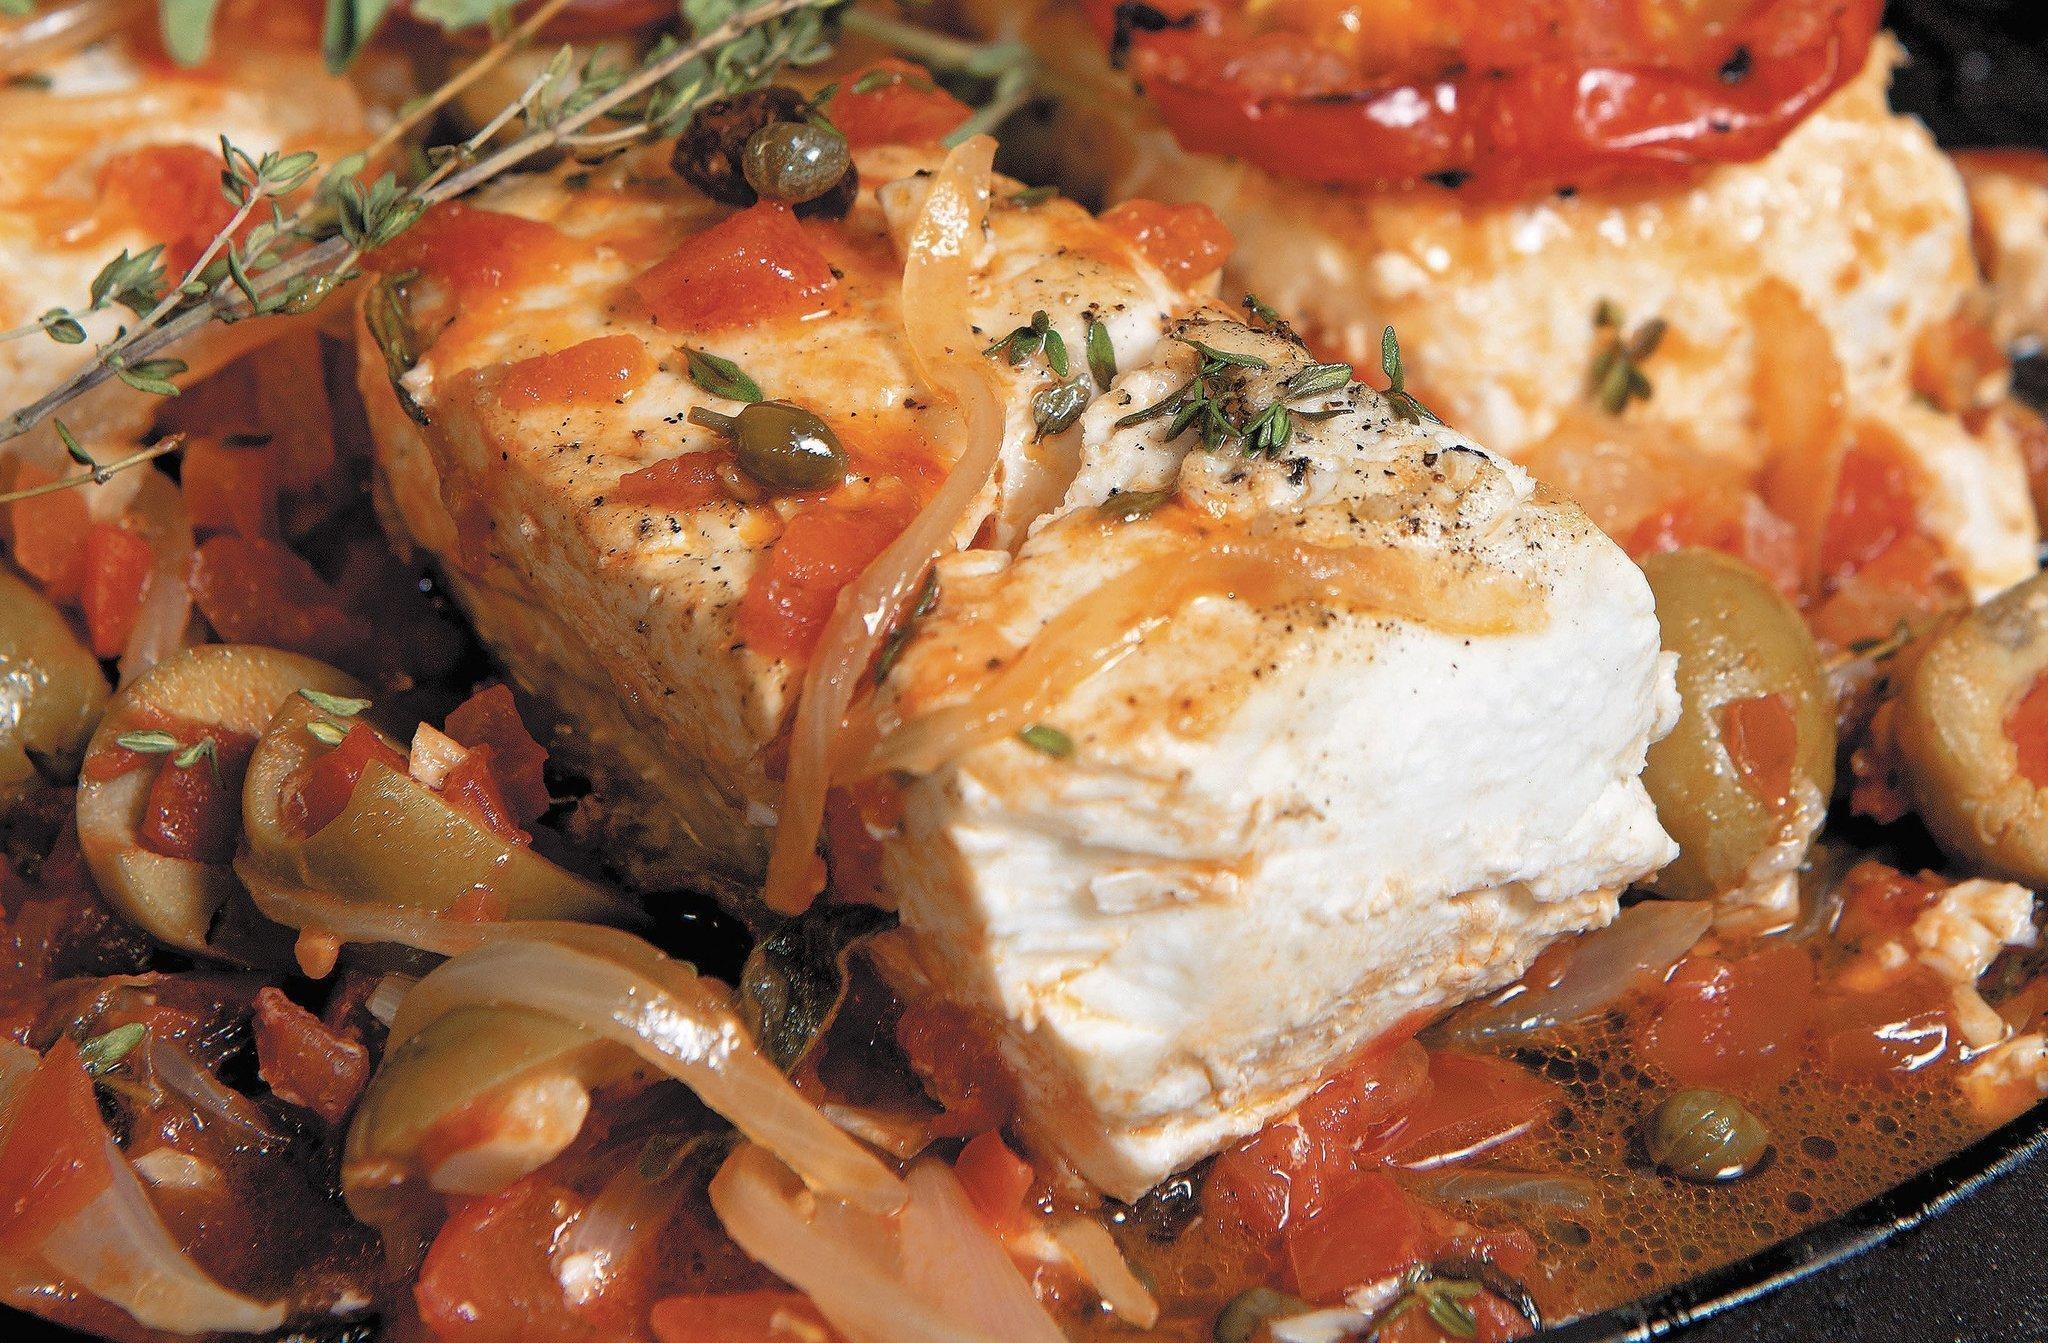 Shannon bard s veracruz style fish the san diego union for Fish veracruz recipe